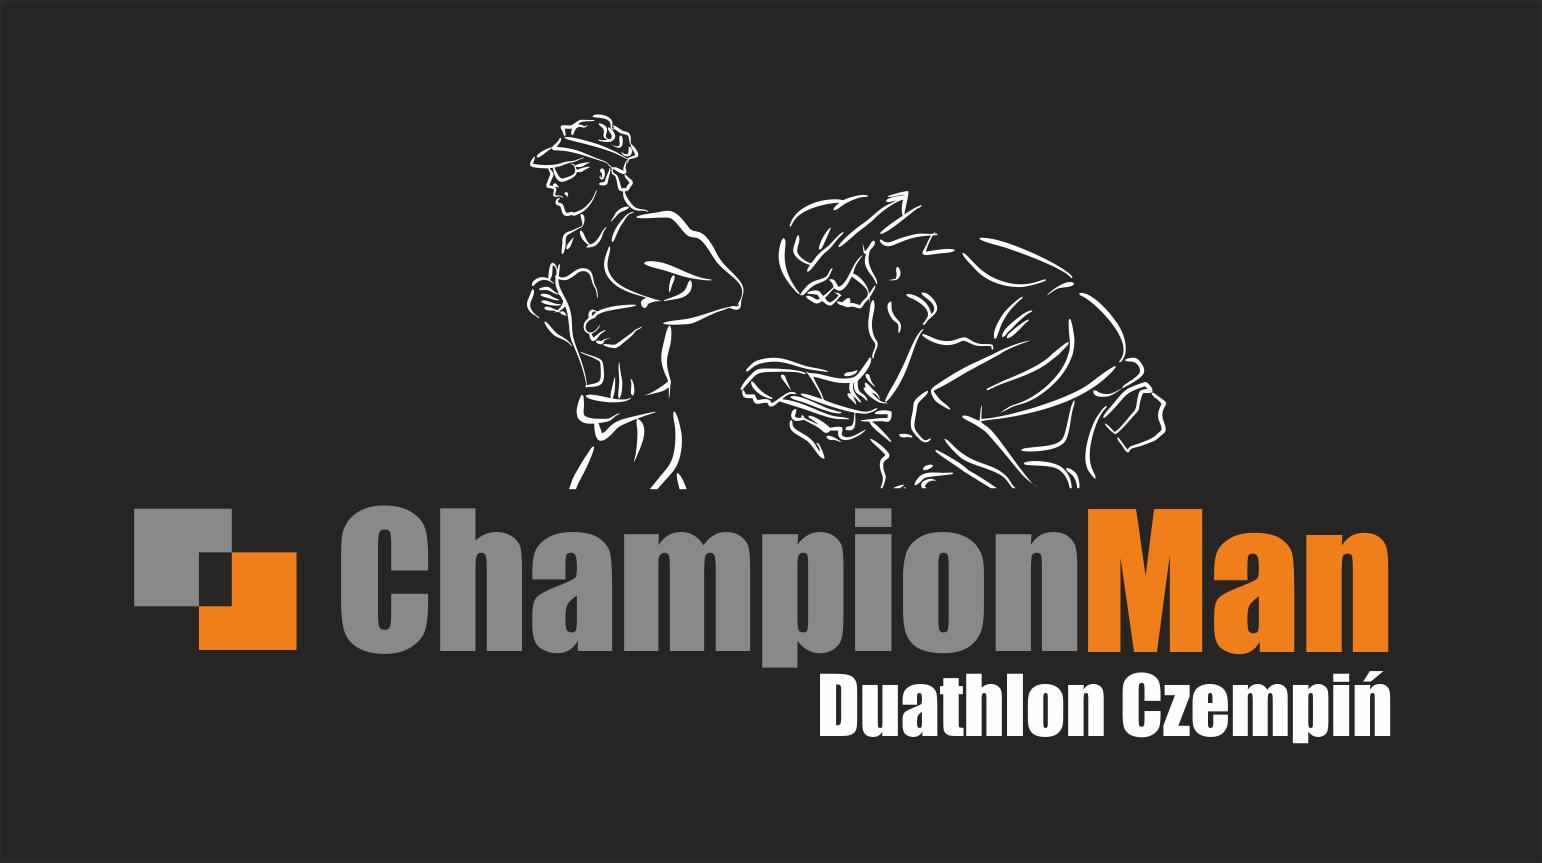 Logo Zawodów ChampionMan Duathlon Czempiń 2022